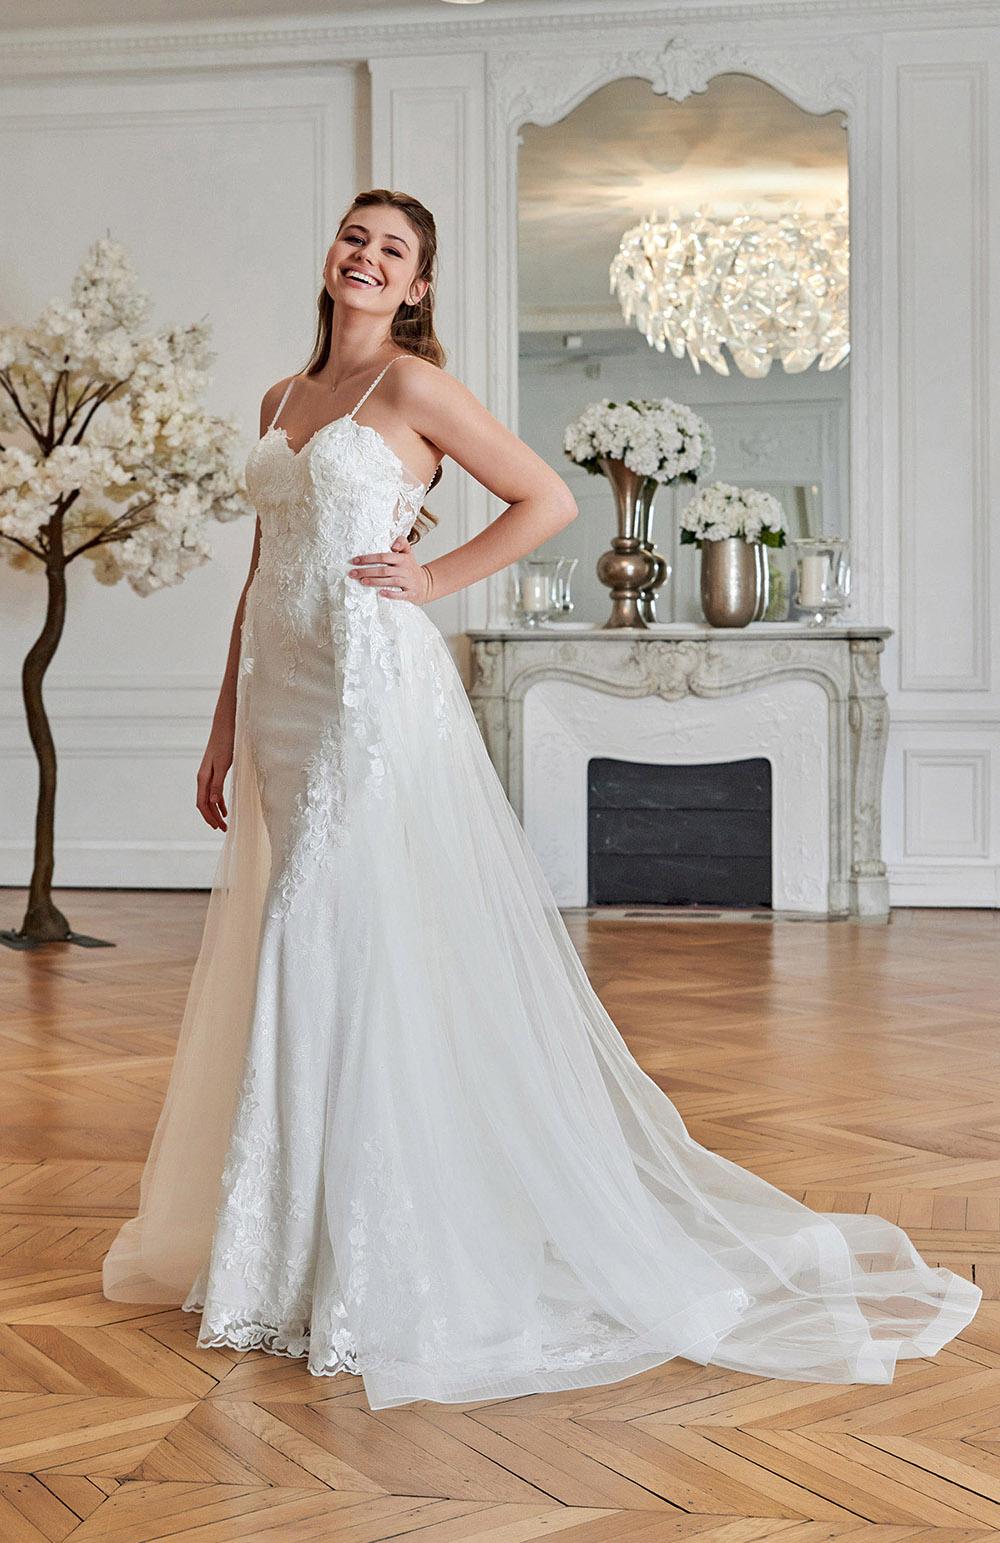 Robe de mariée Modèle Ecrin